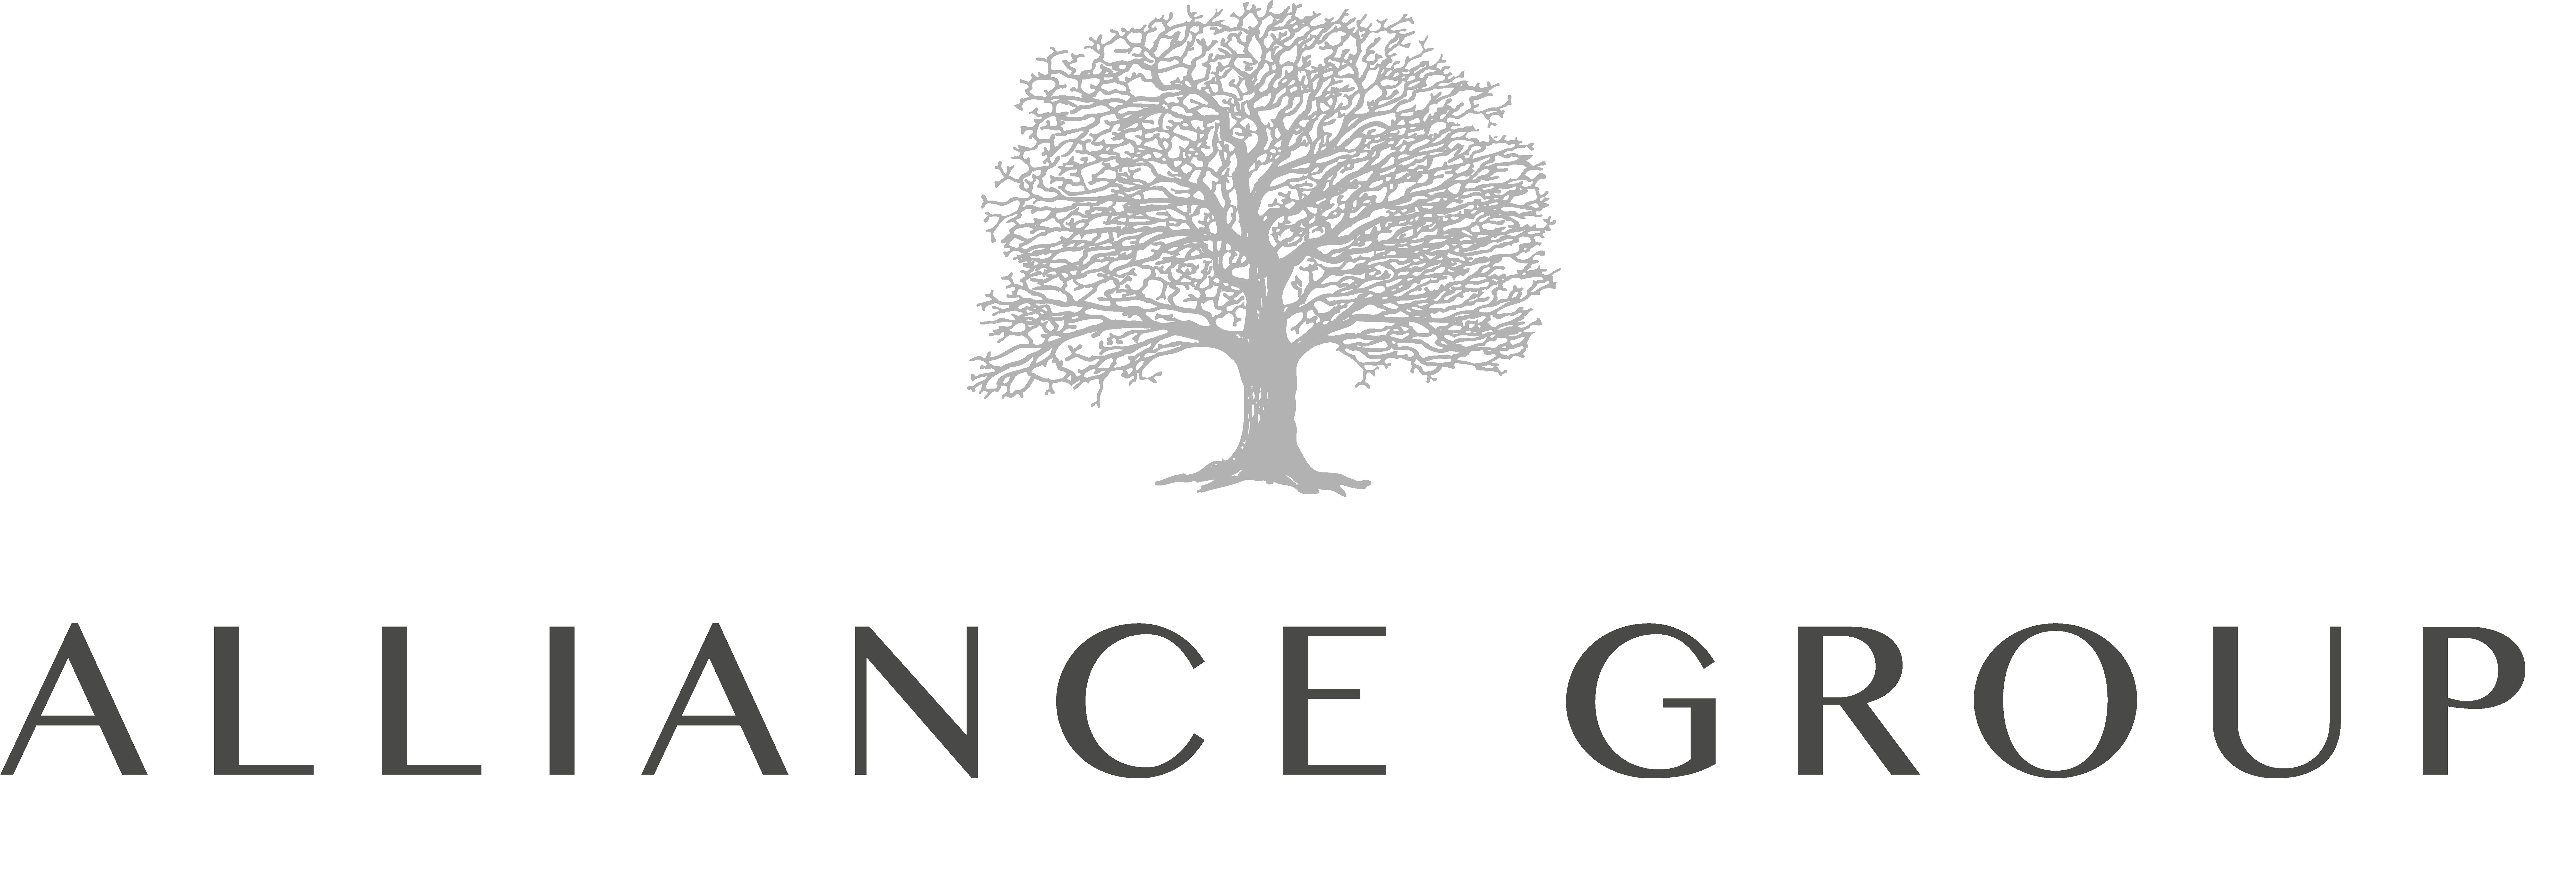 Alliance Group